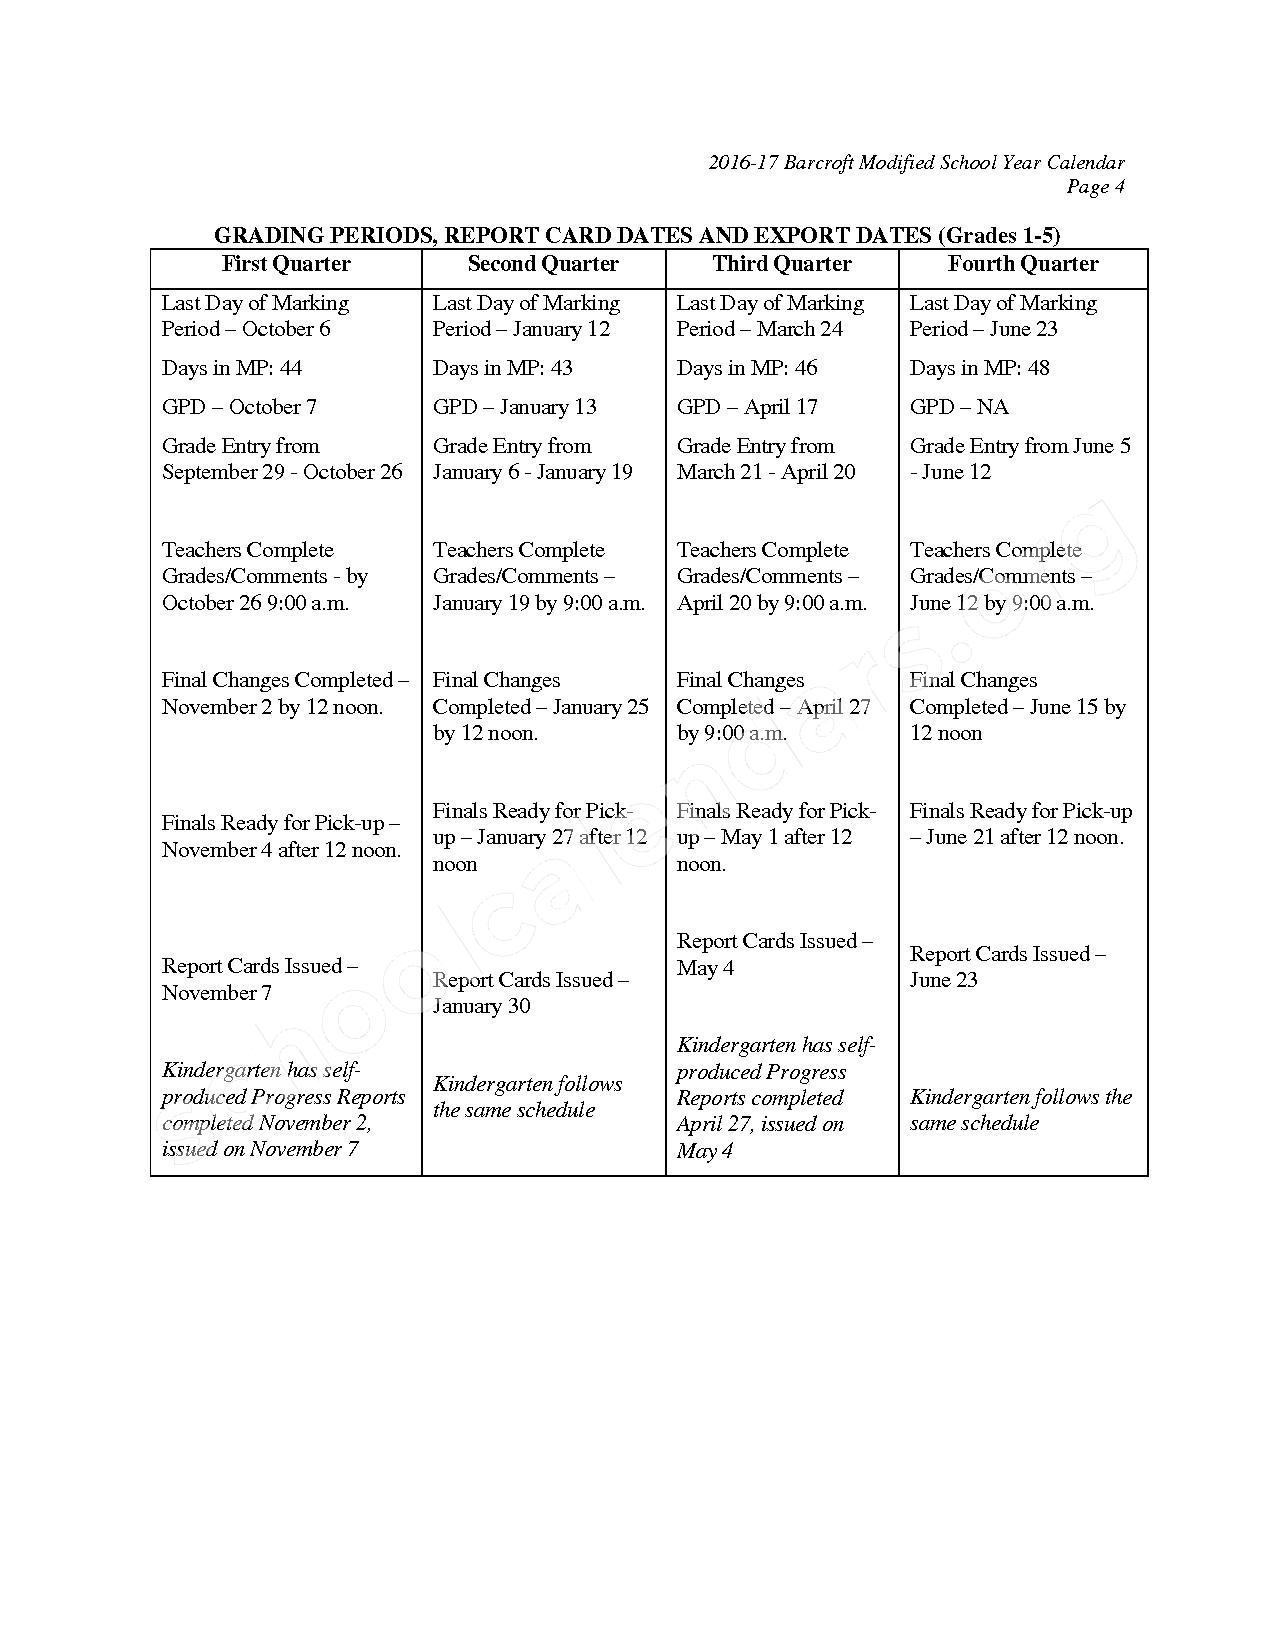 2016 - 2017 Barcroft Calendar – Barcroft Elementary School – page 5